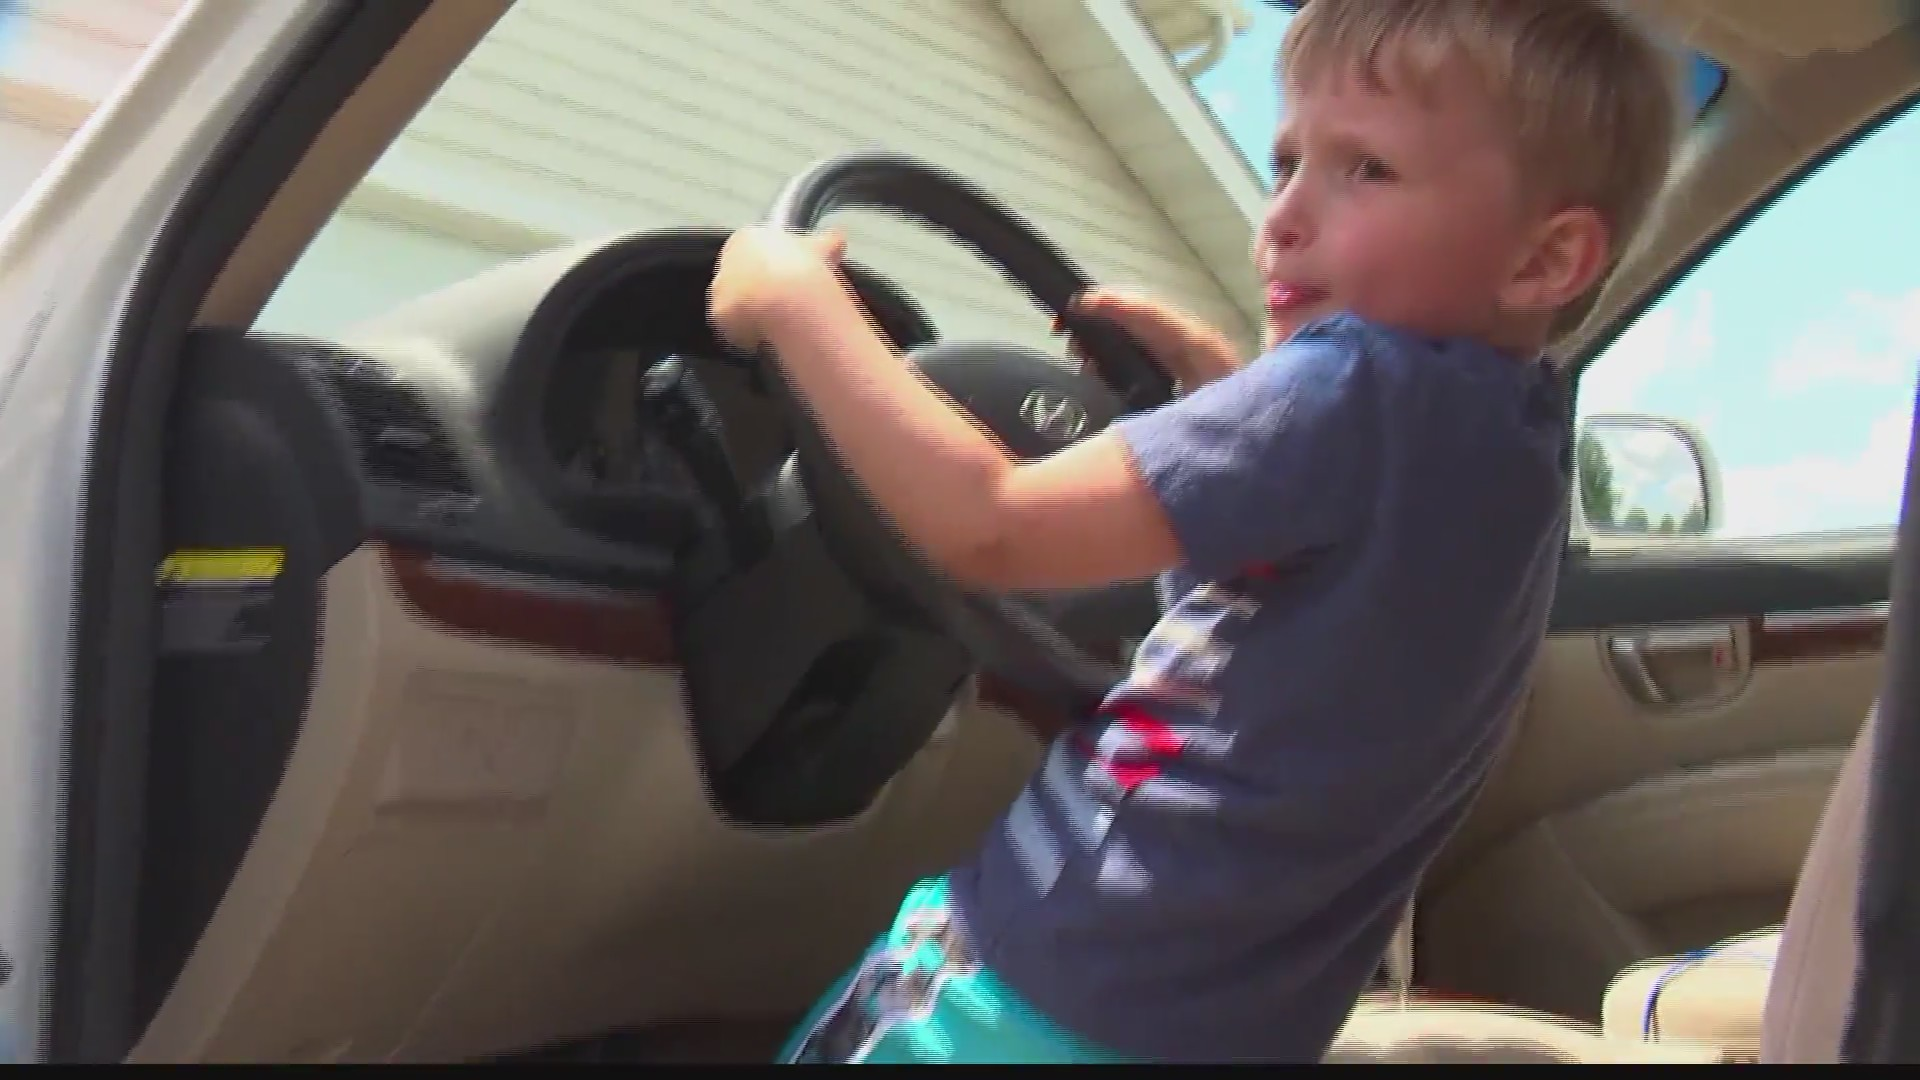 Four_year_old_drives_grandpa_s_car_to_ga_0_20190614092827